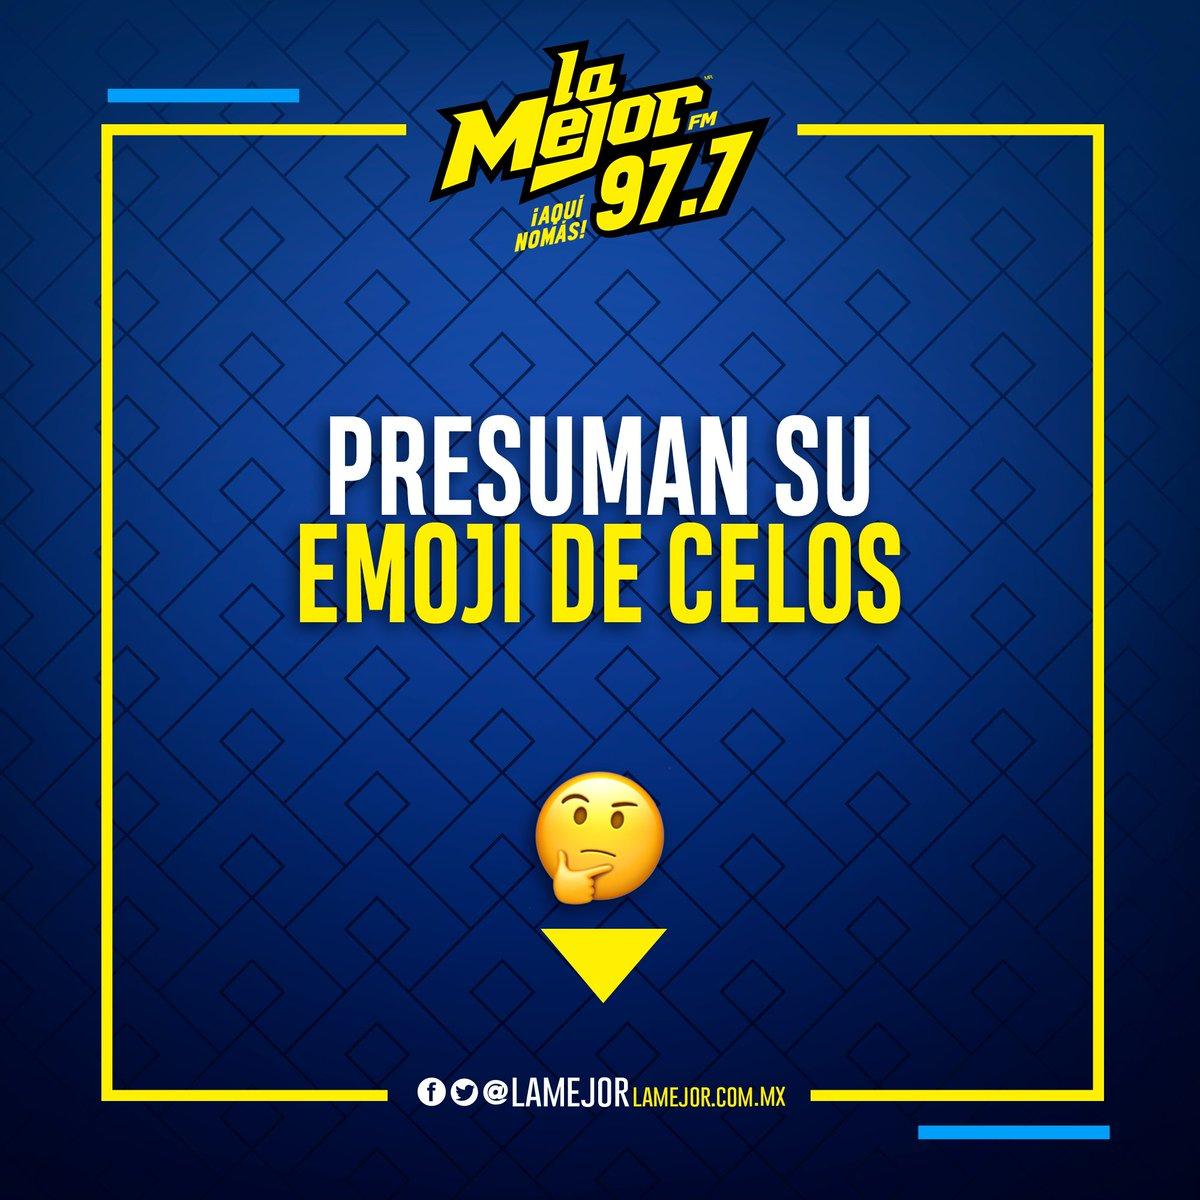 #Meme L@s ponemos atención 🤔  #AquíNomás La Mejor FM 97.7 📻 https://t.co/E2BT99hqT2